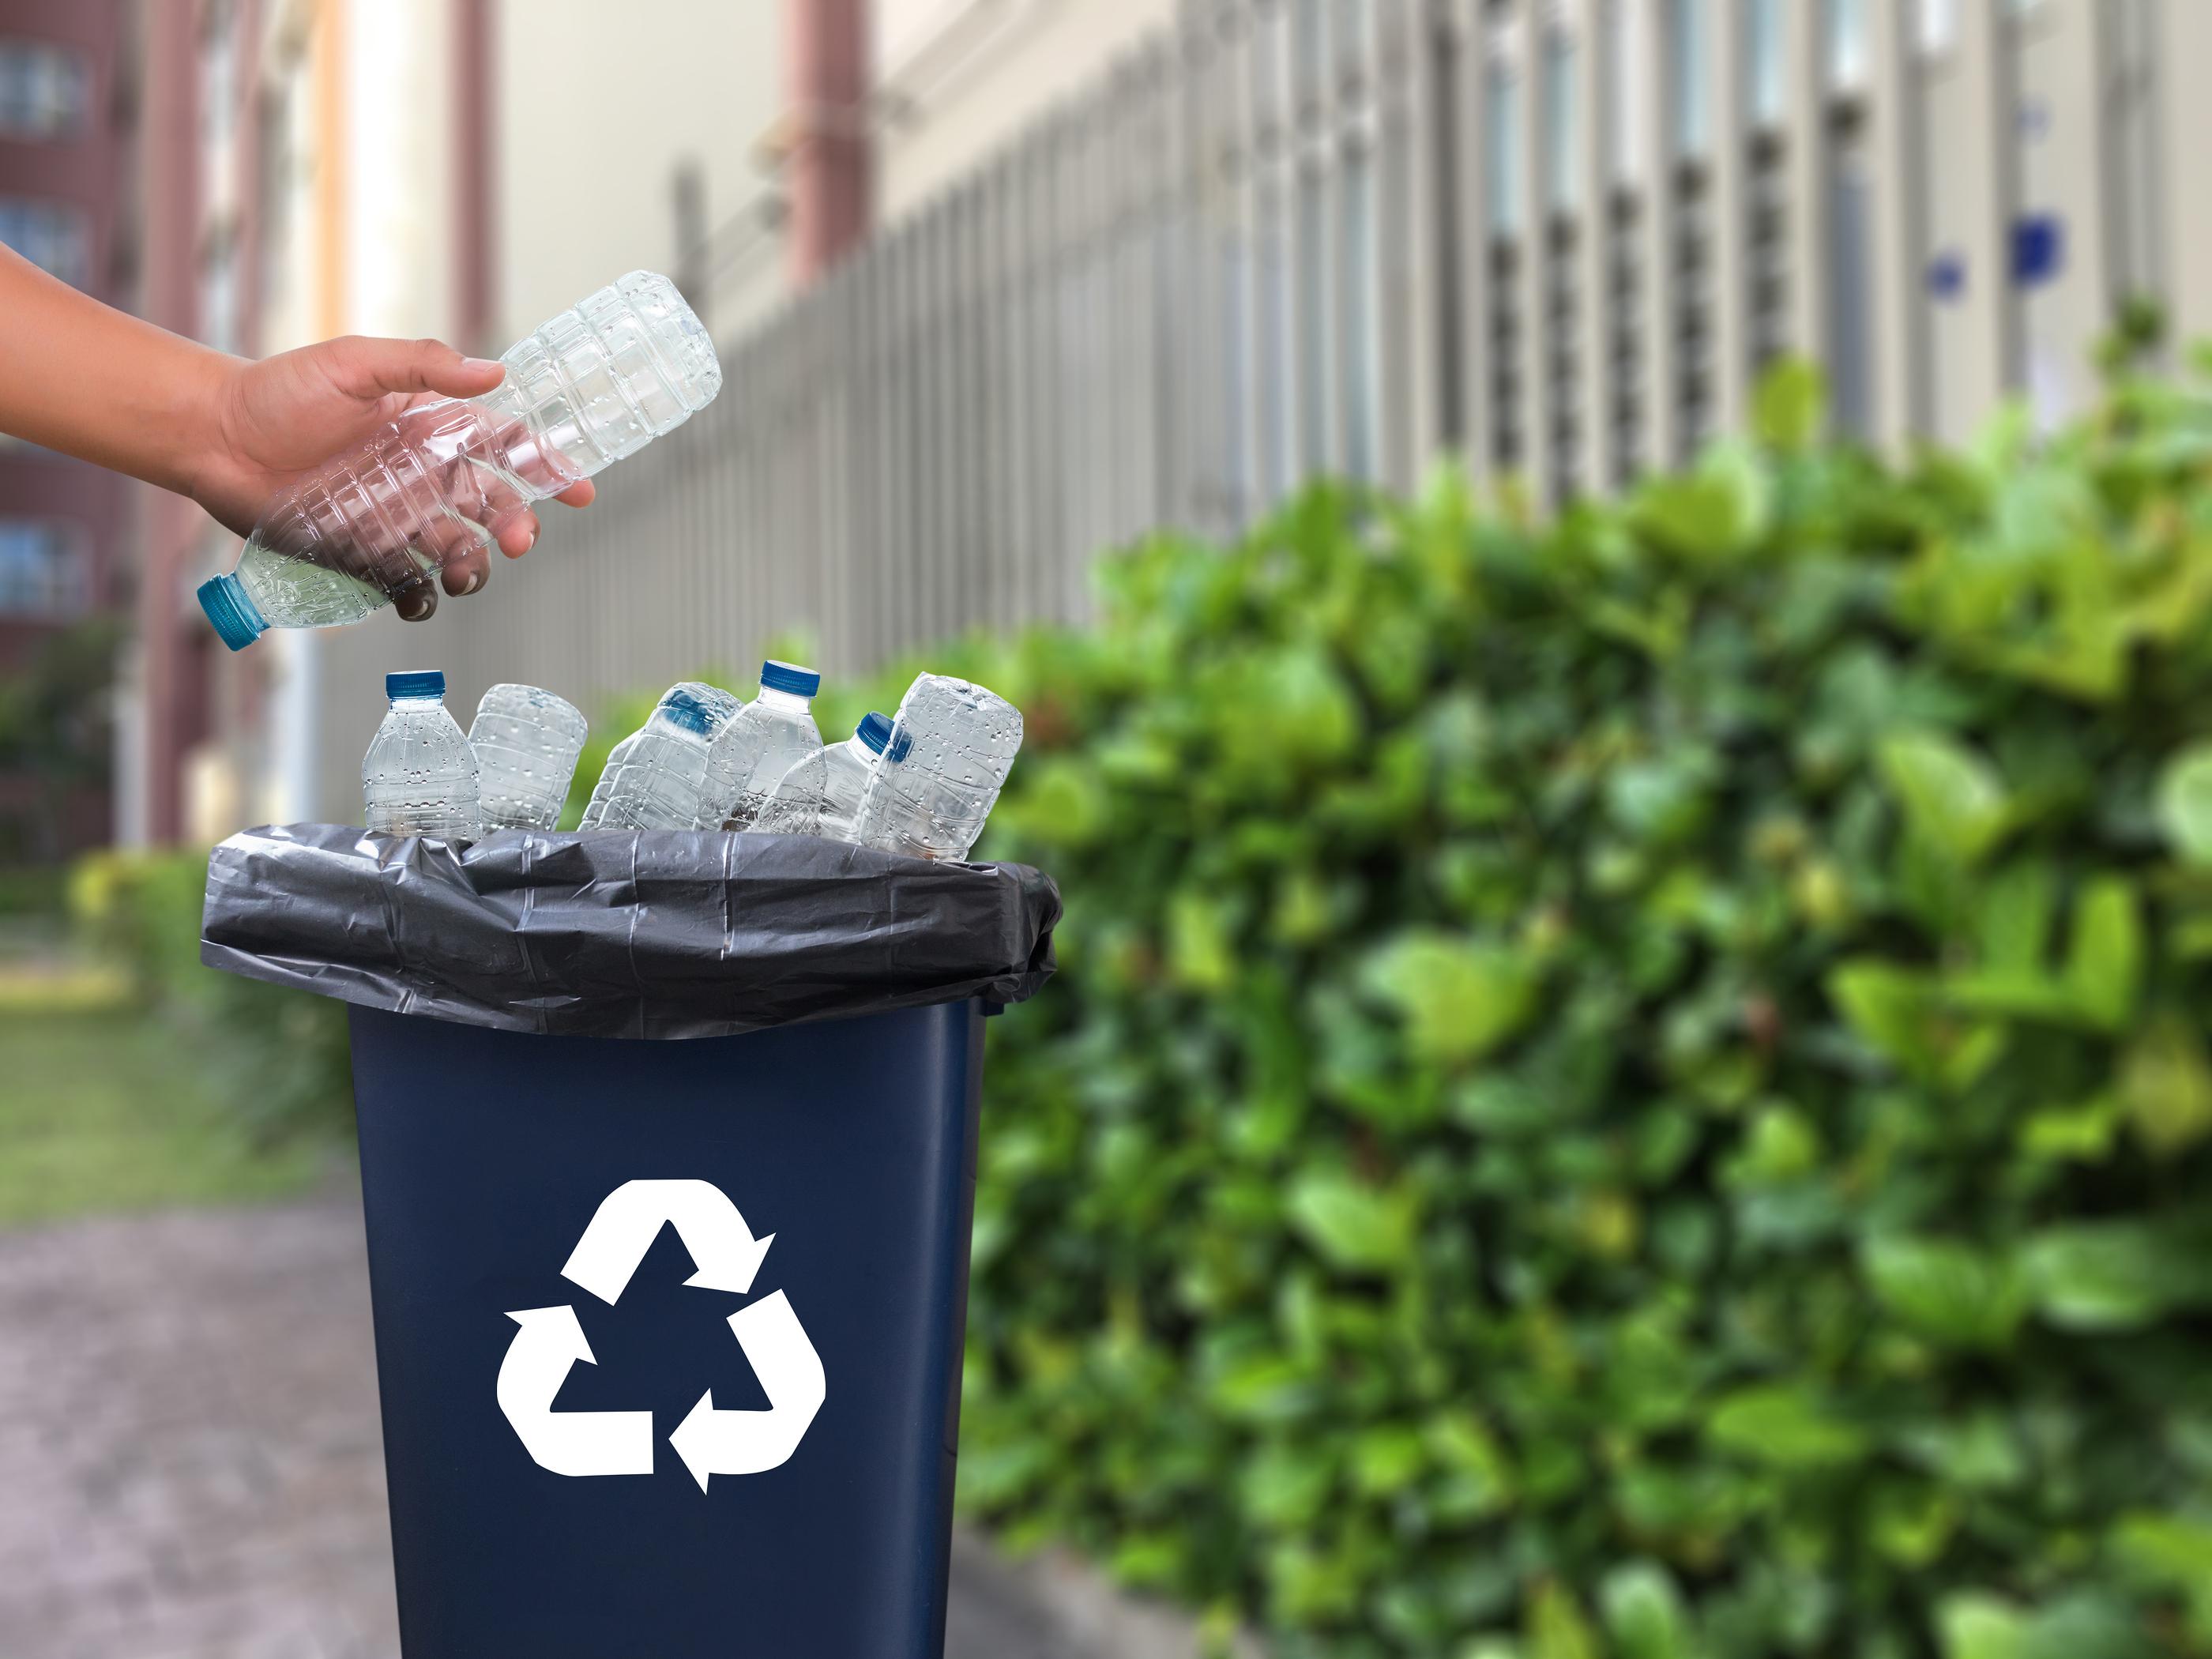 Plastic recycling bin